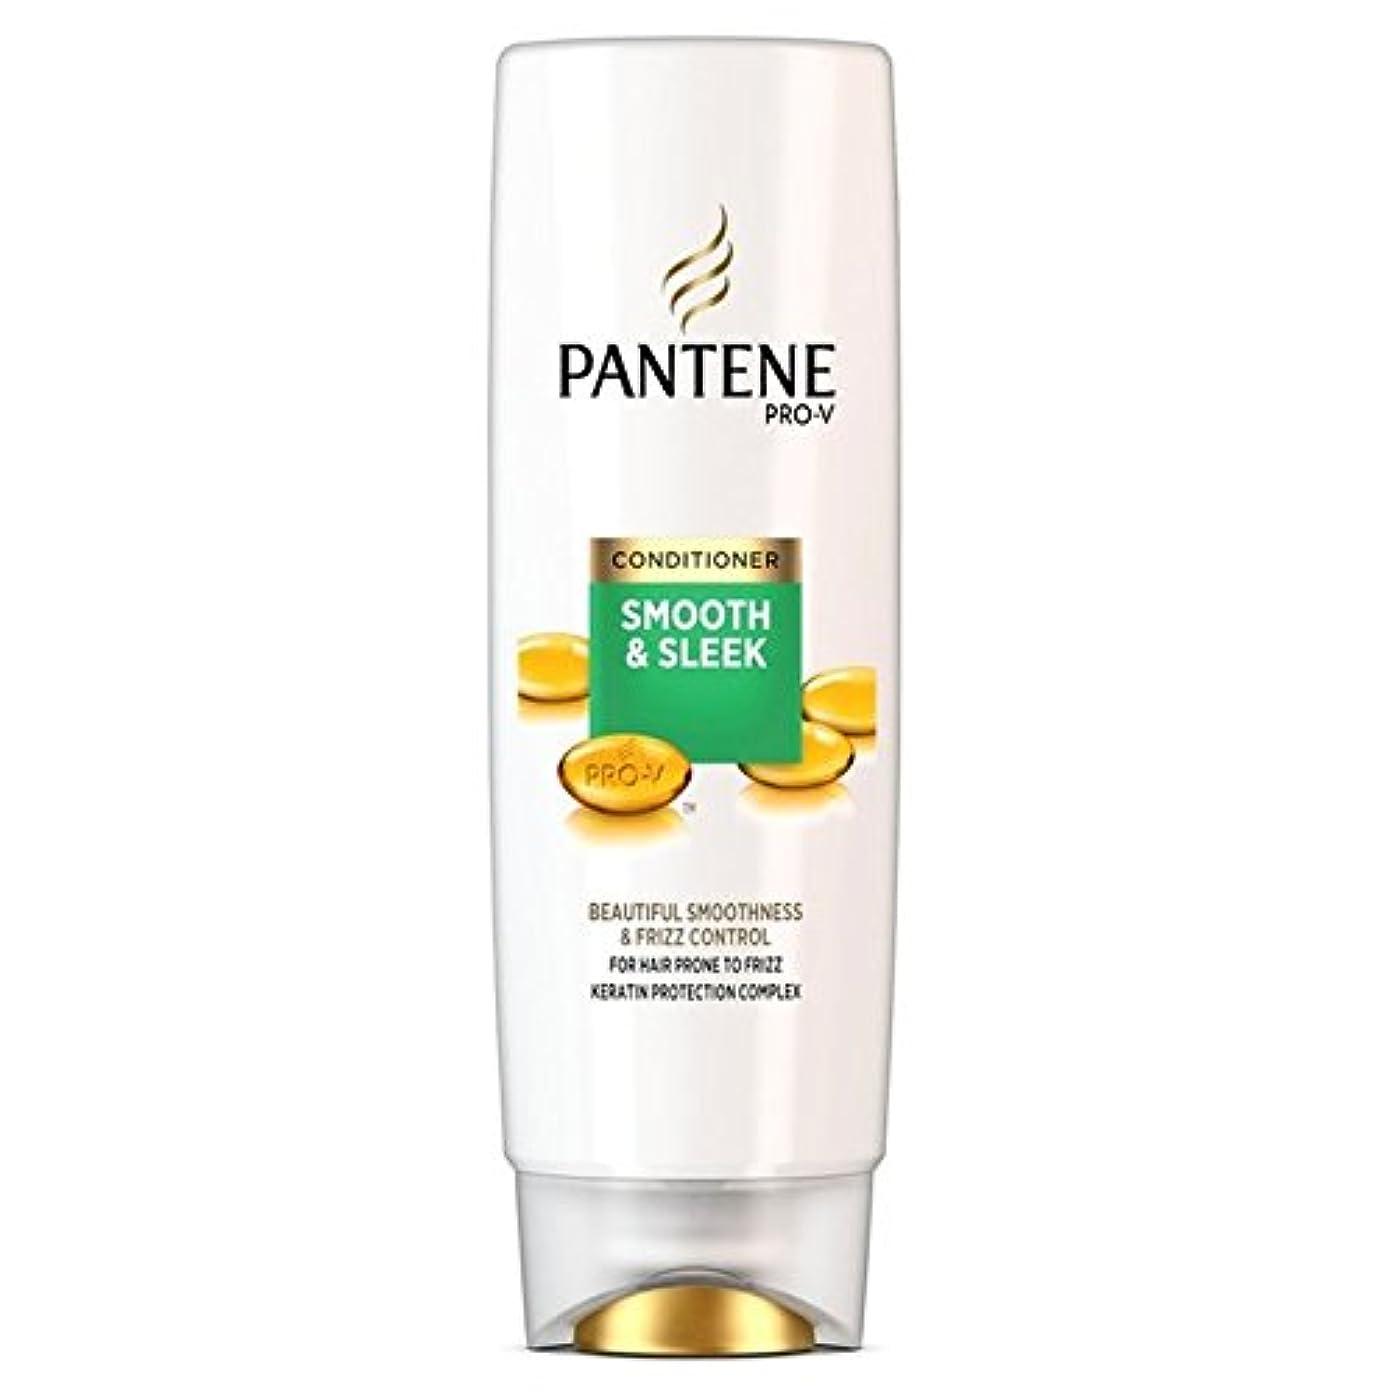 Pantene Conditioner Smooth & Sleek For Hair Prone to Frizz 250ml (Pack of 6) - パンテーンコンディショナースムーズ&縮れ250ミリリットルを受...